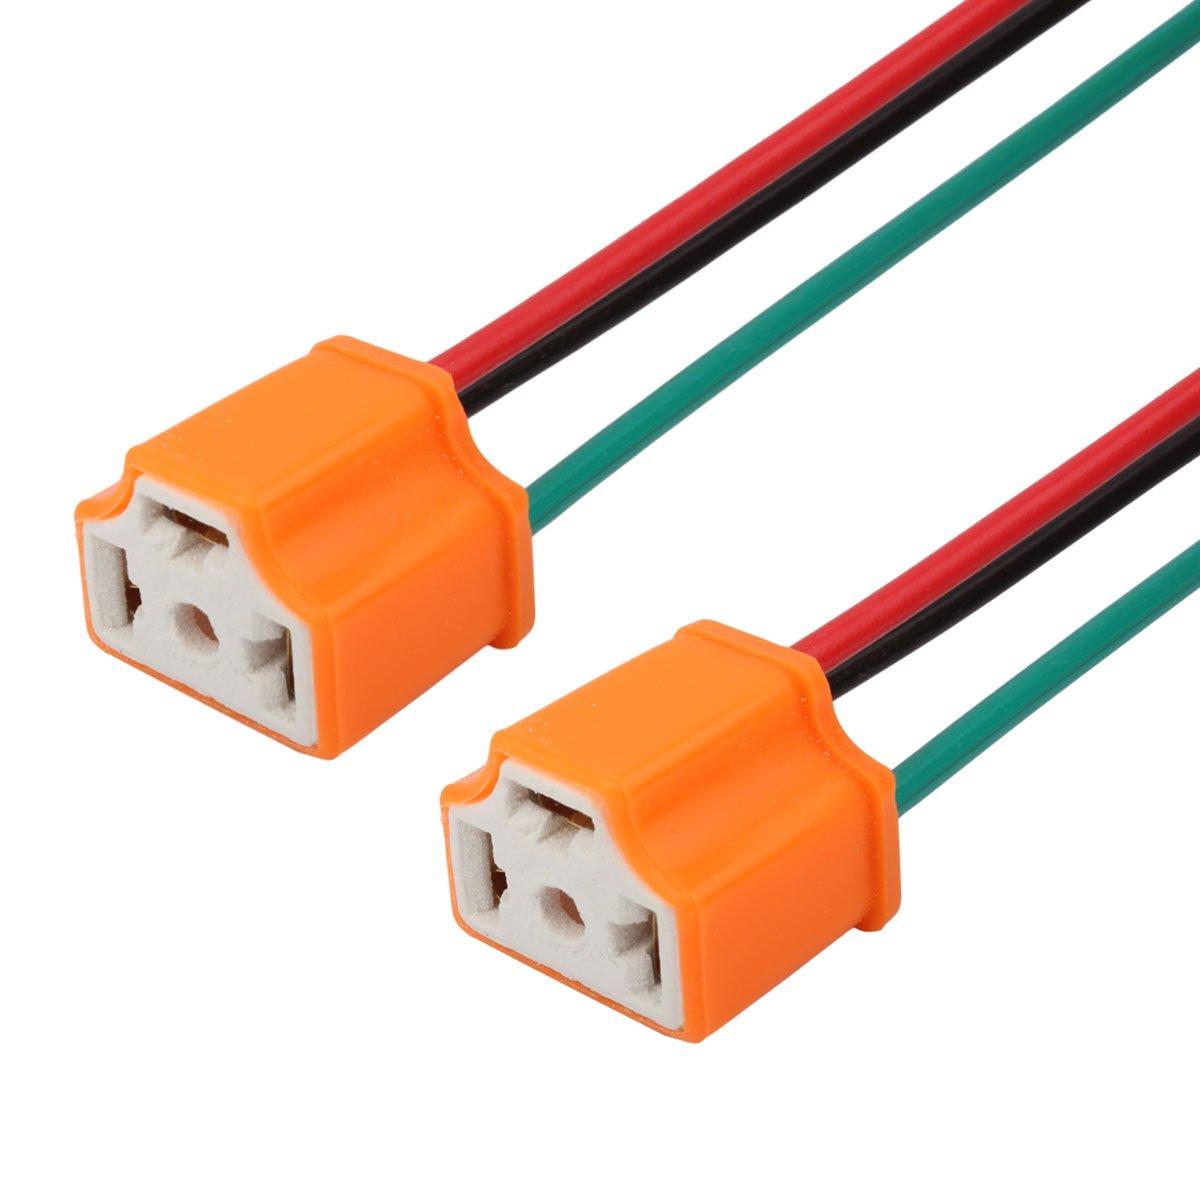 12v car wiring connectors amazon co uk rh amazon co uk 12V Wiring Basics 12V Switch Wiring